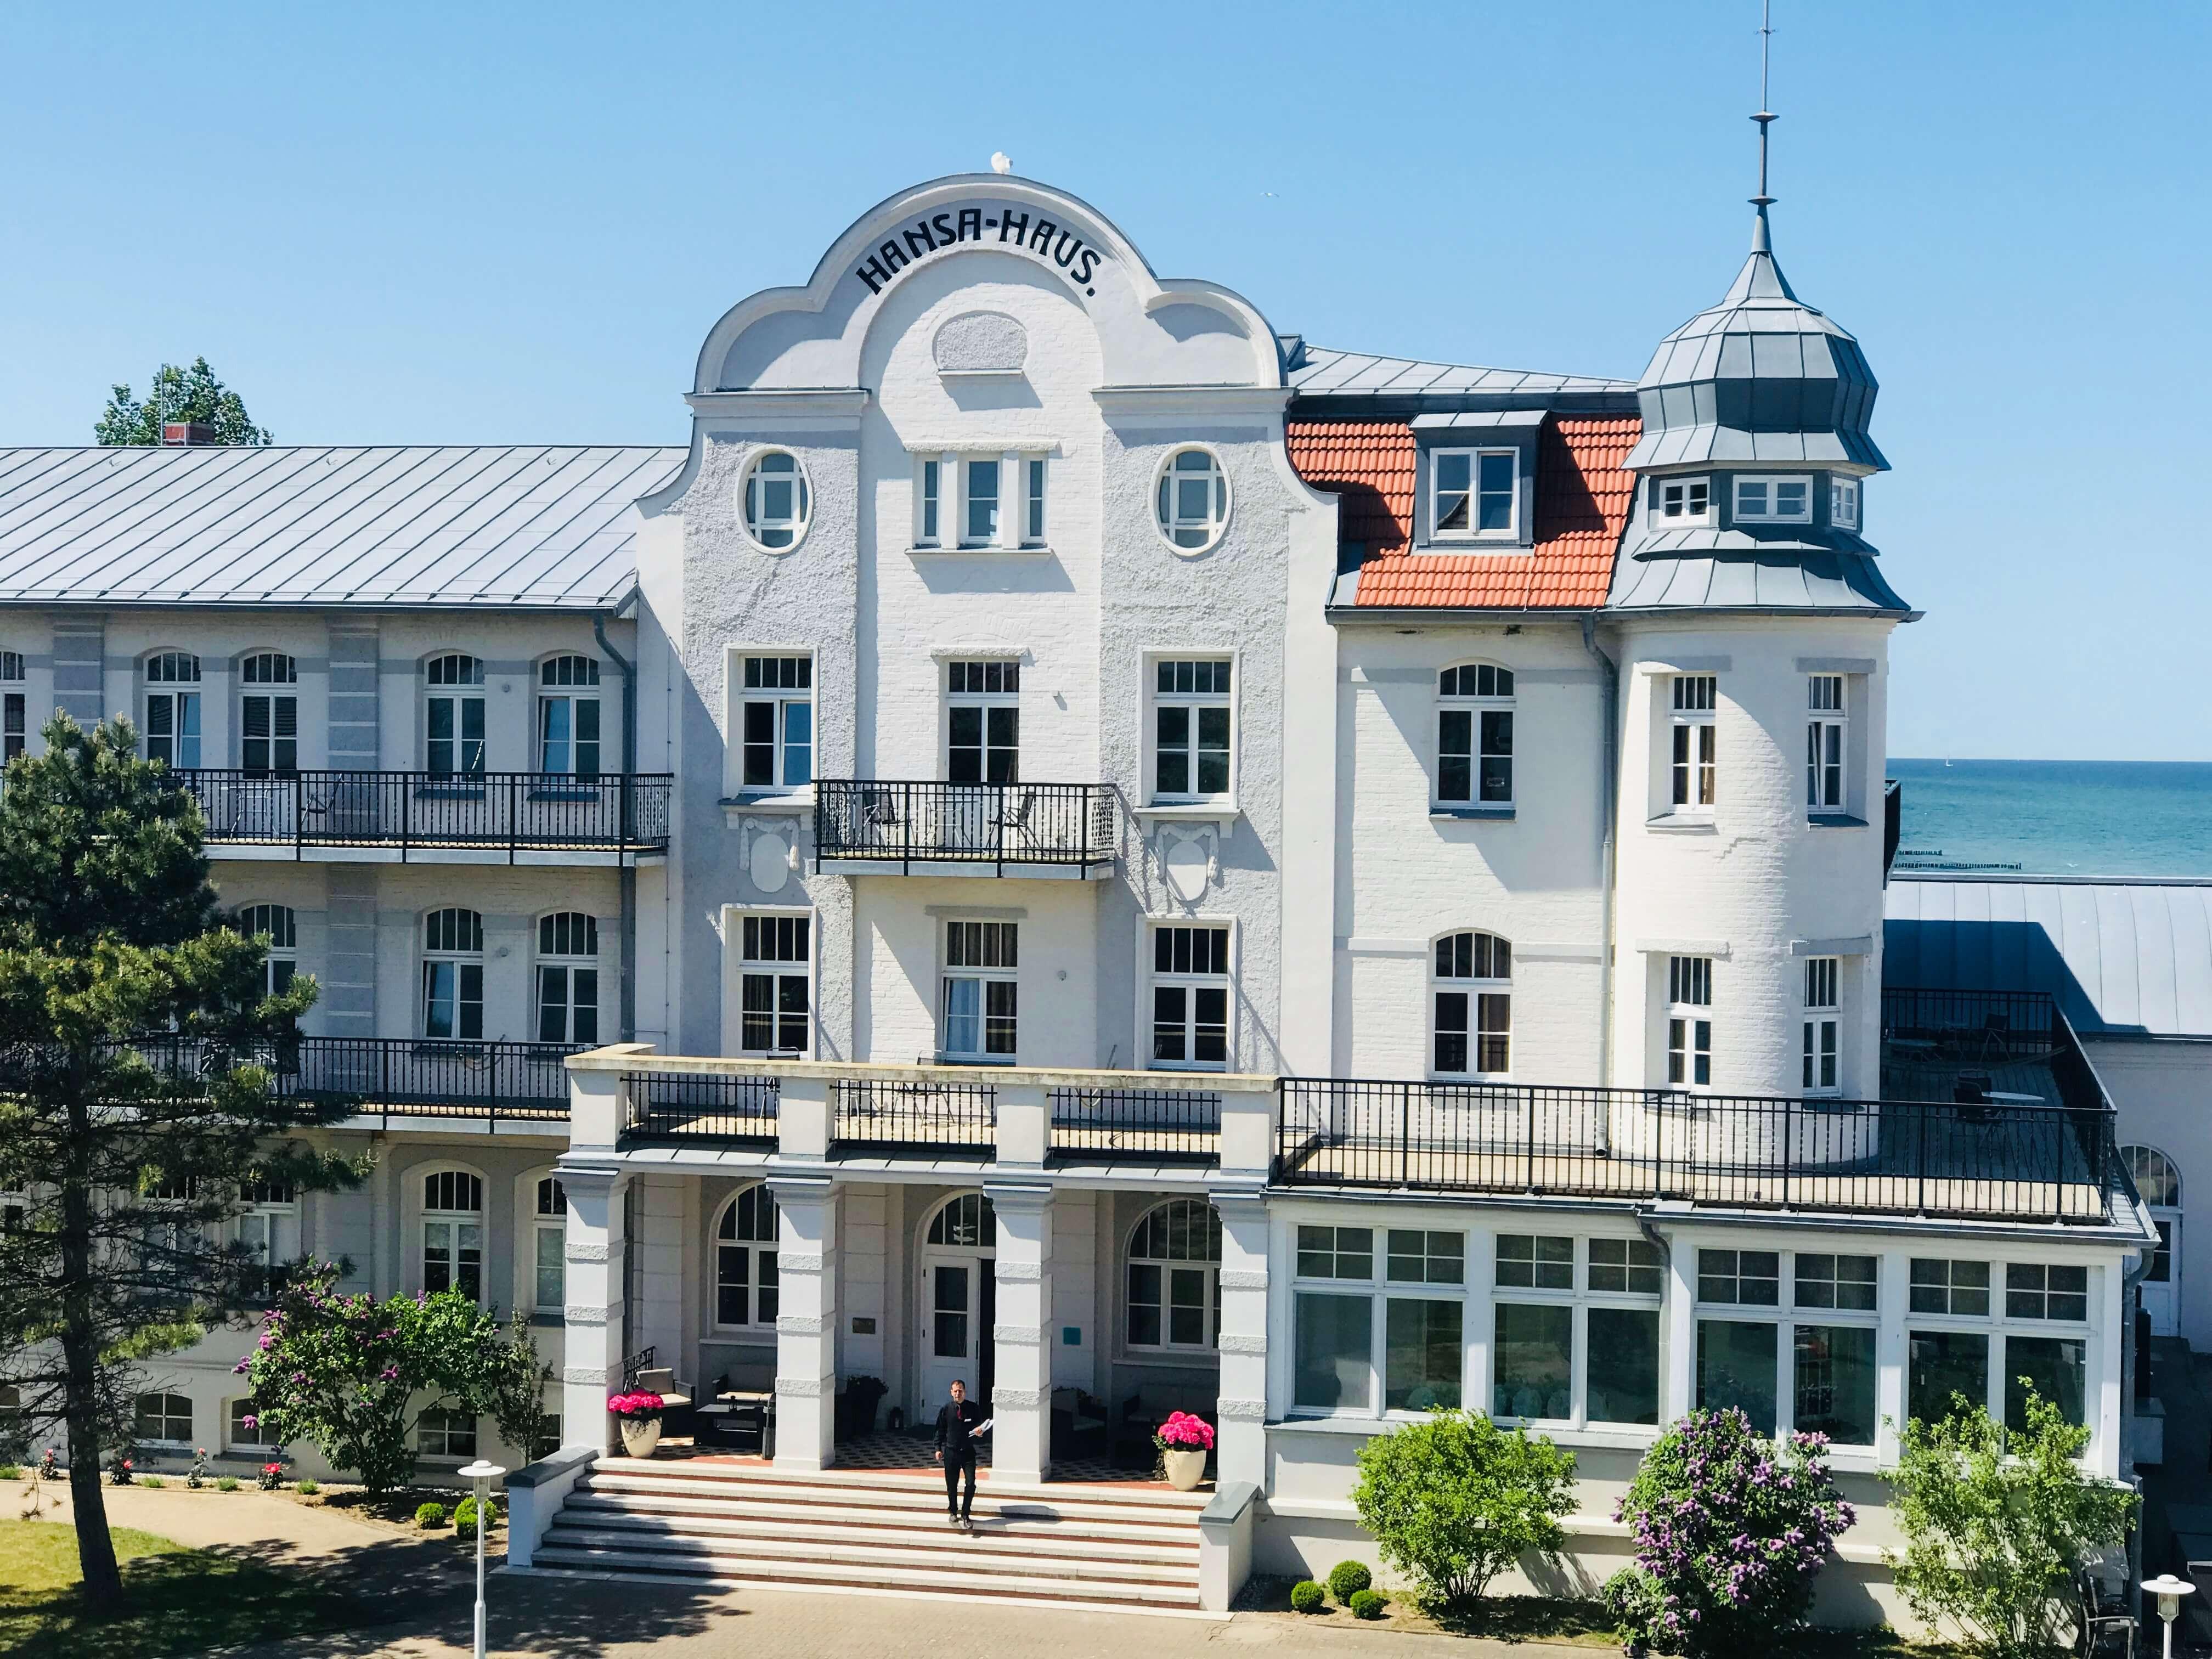 Hansa Haus  Hotels in Kühlungsborn Hansa Haus & Schloss am Meer